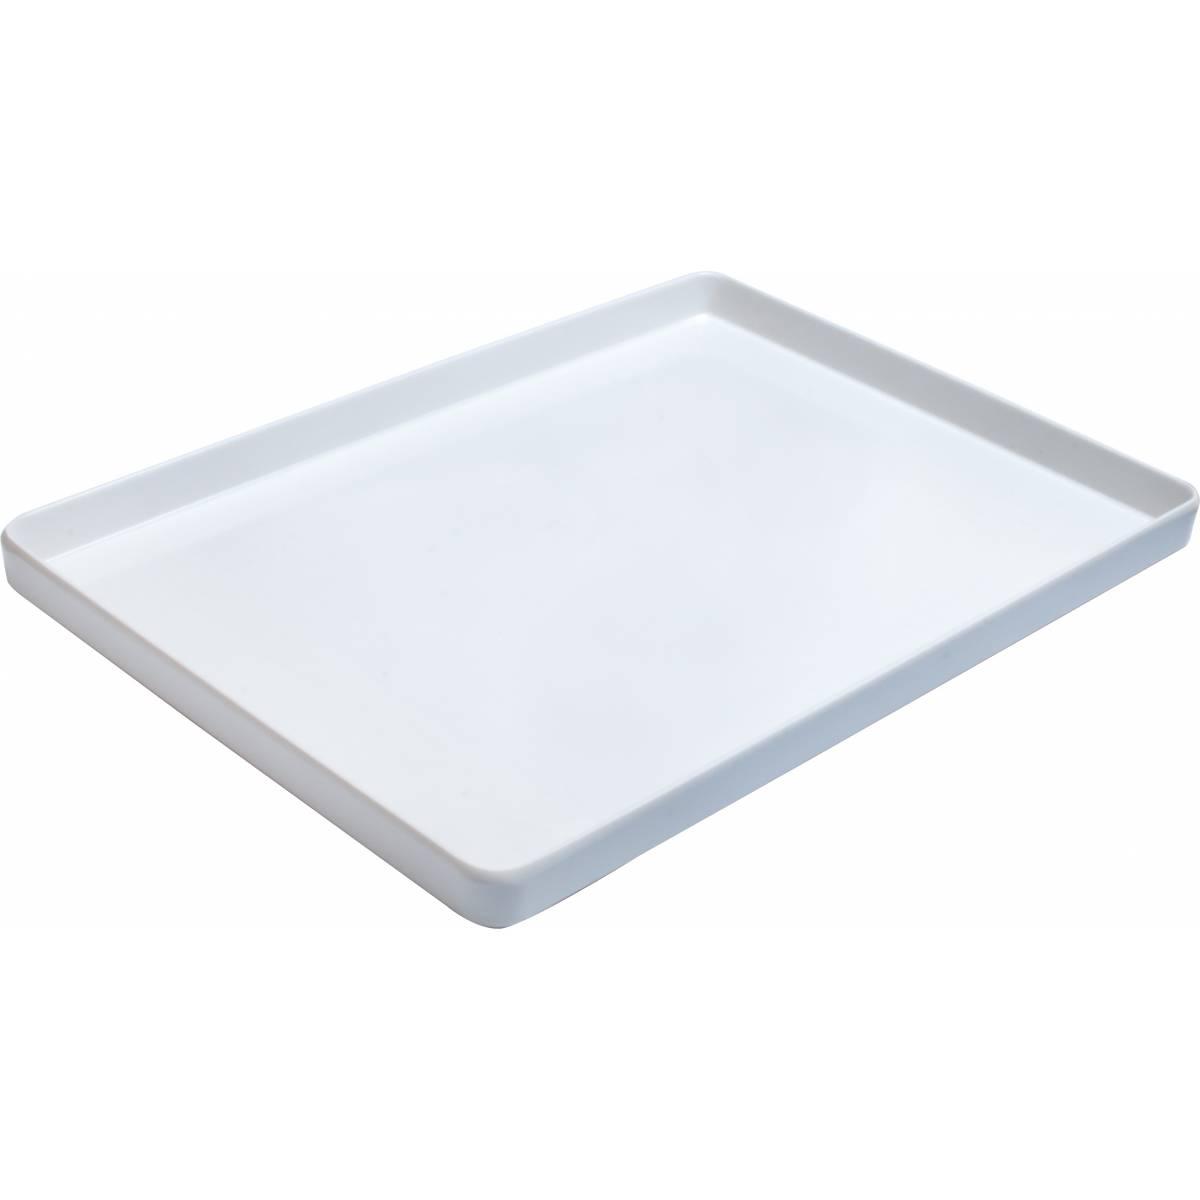 Поднос белый 395x280x24 мм, меламин E Main White HSG